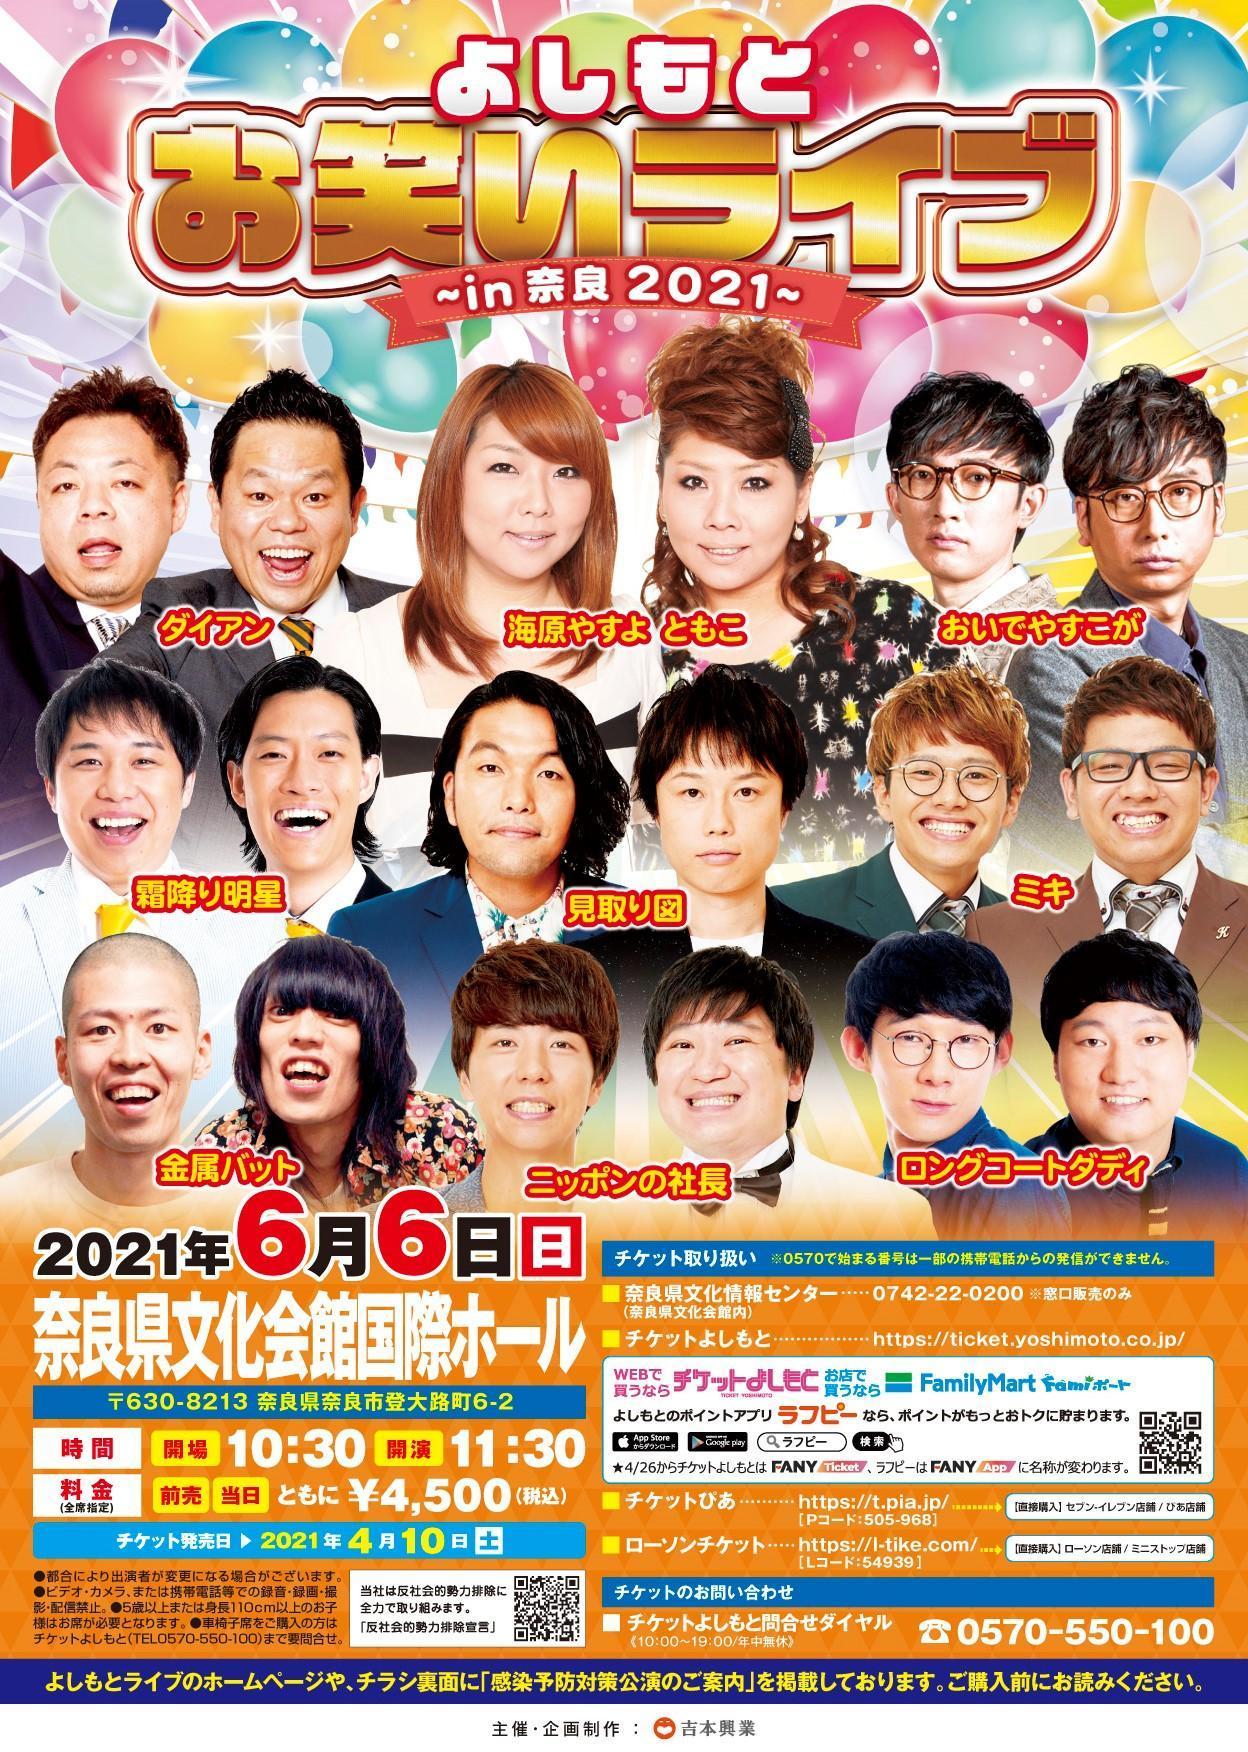 http://www.syumatsu.jp/20210409113522-749f967ca766b84576515a1bf5bda1e161e397fc.jpg